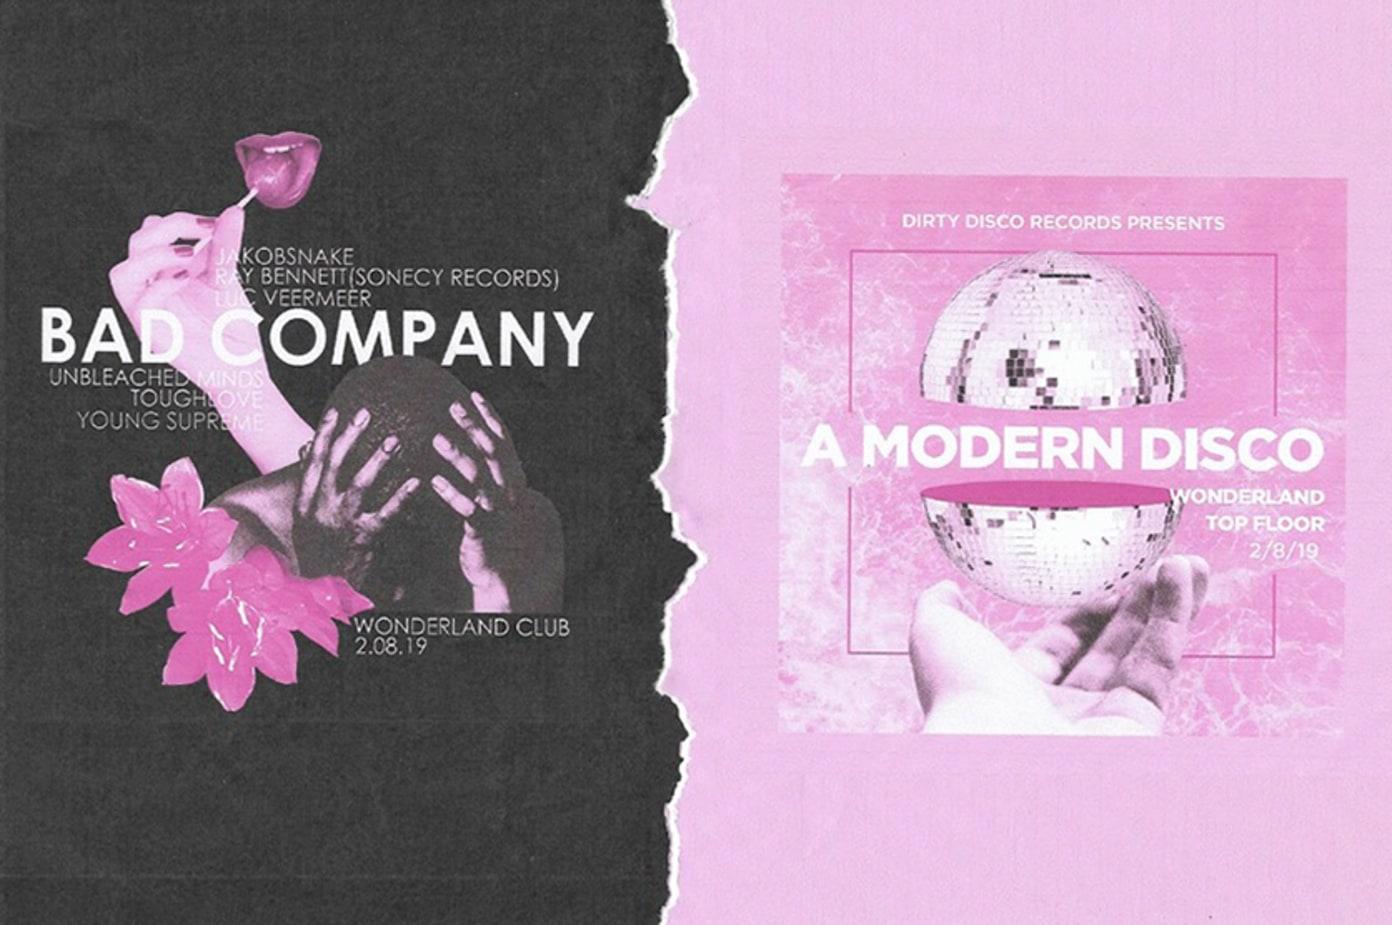 Bad Company x A Modern Disco Tonight